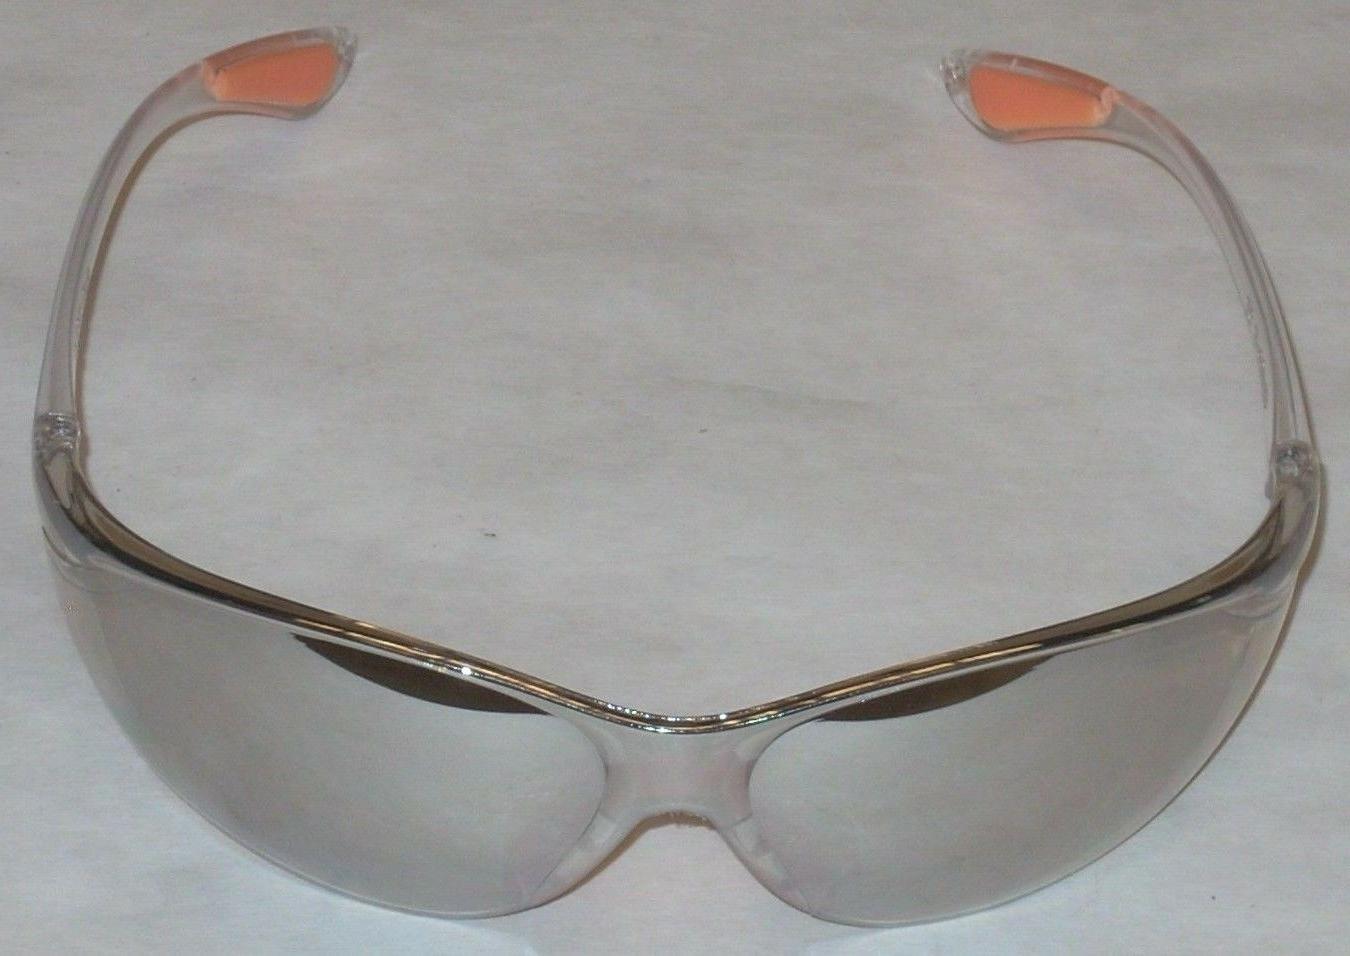 10 pr Clear Glasses & Cushions Tint Durable